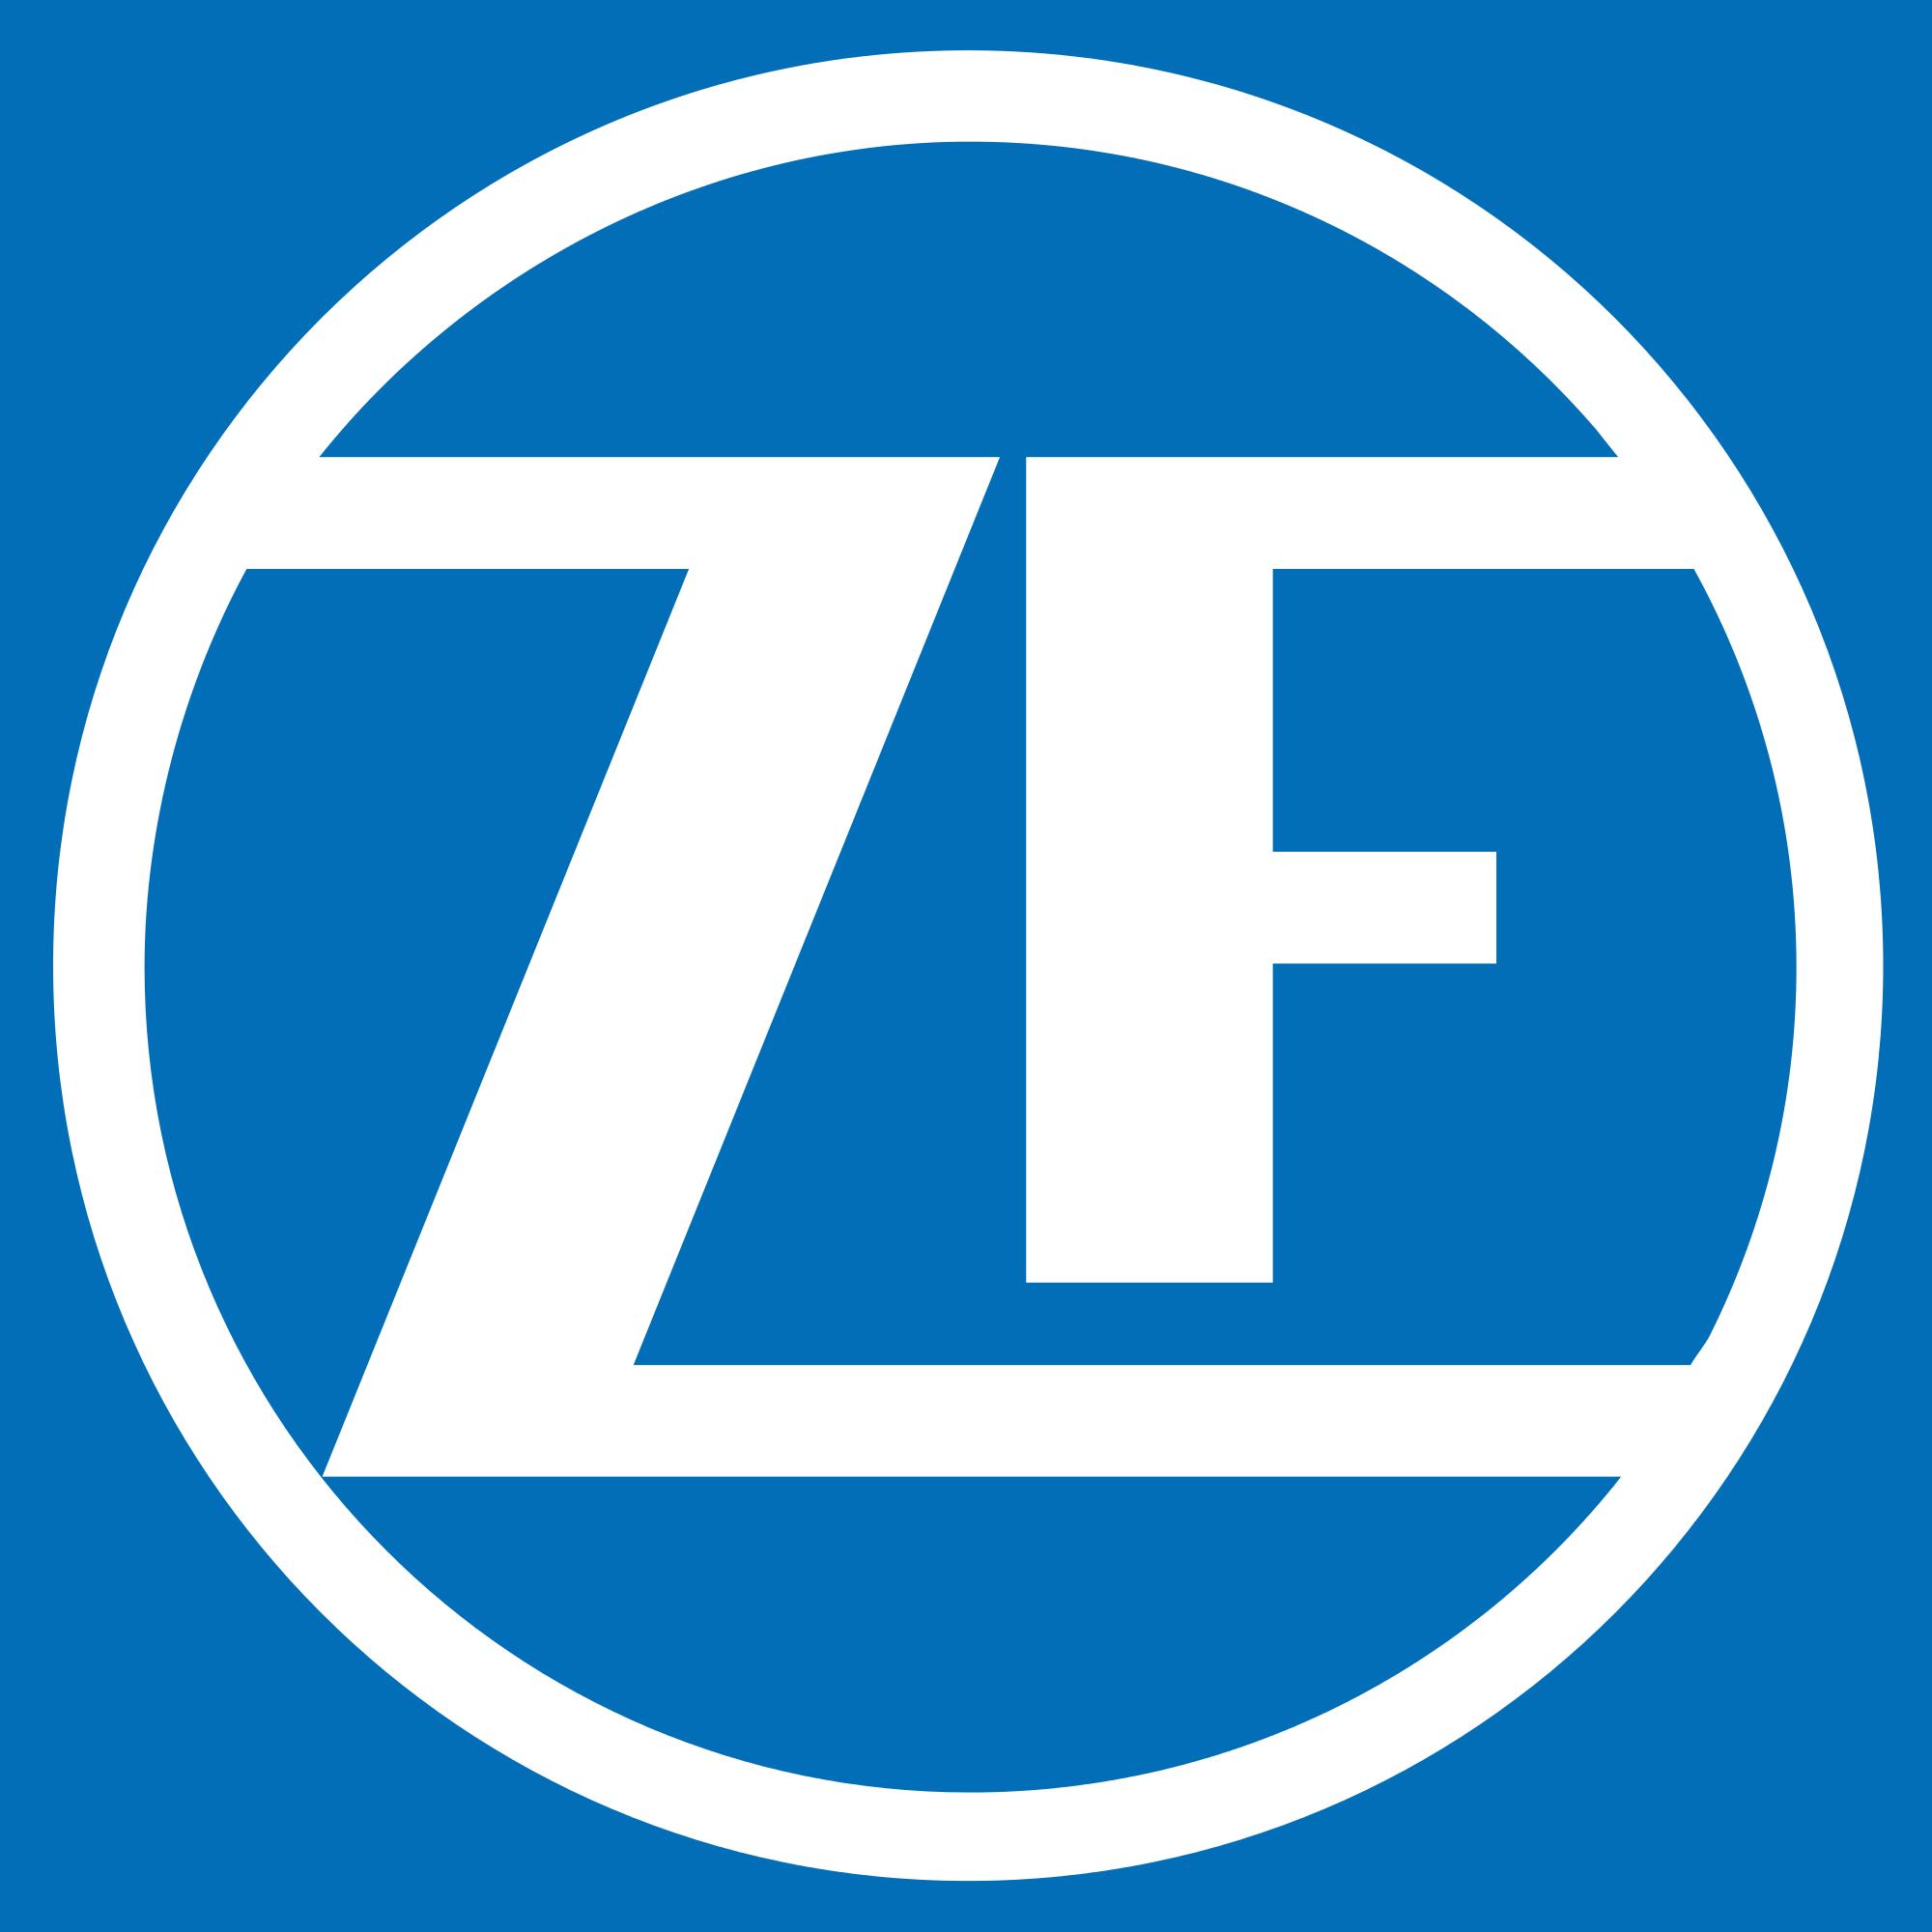 zf do brasil.png